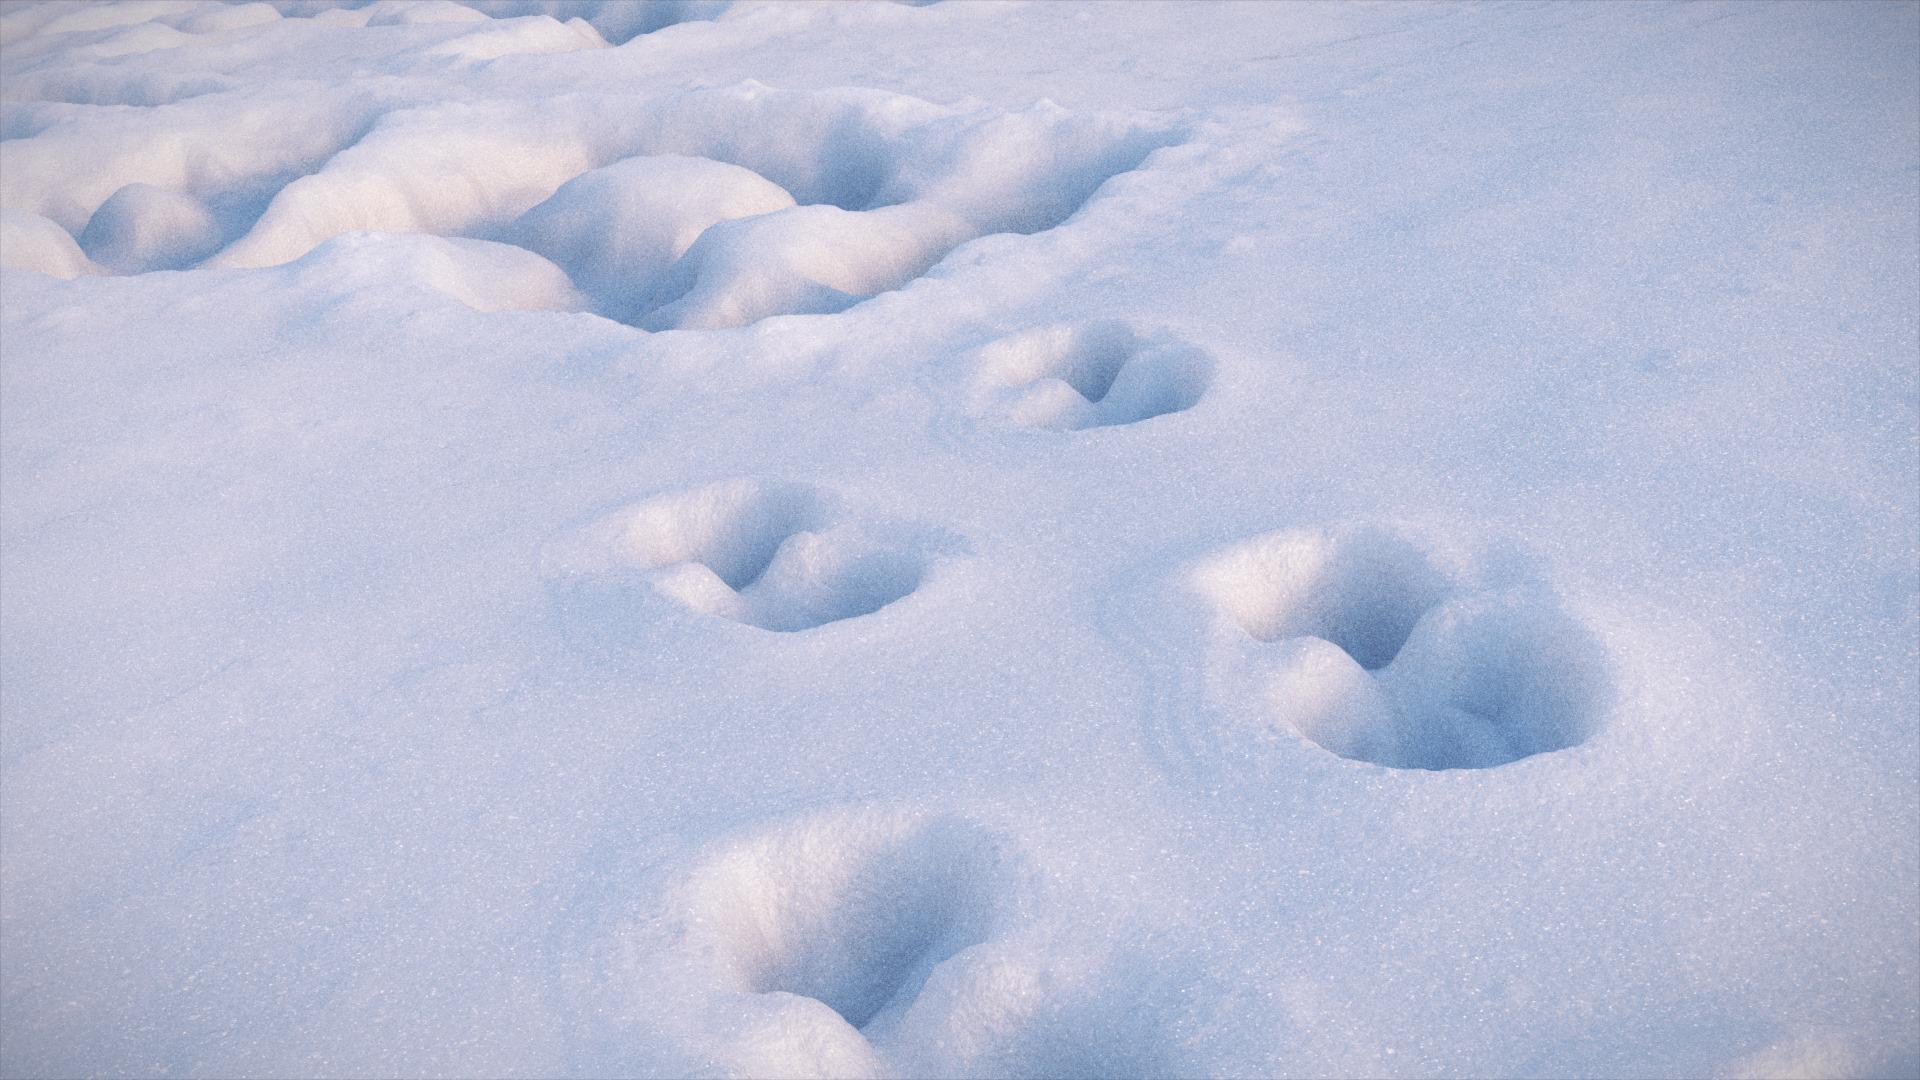 newyear_snow_03